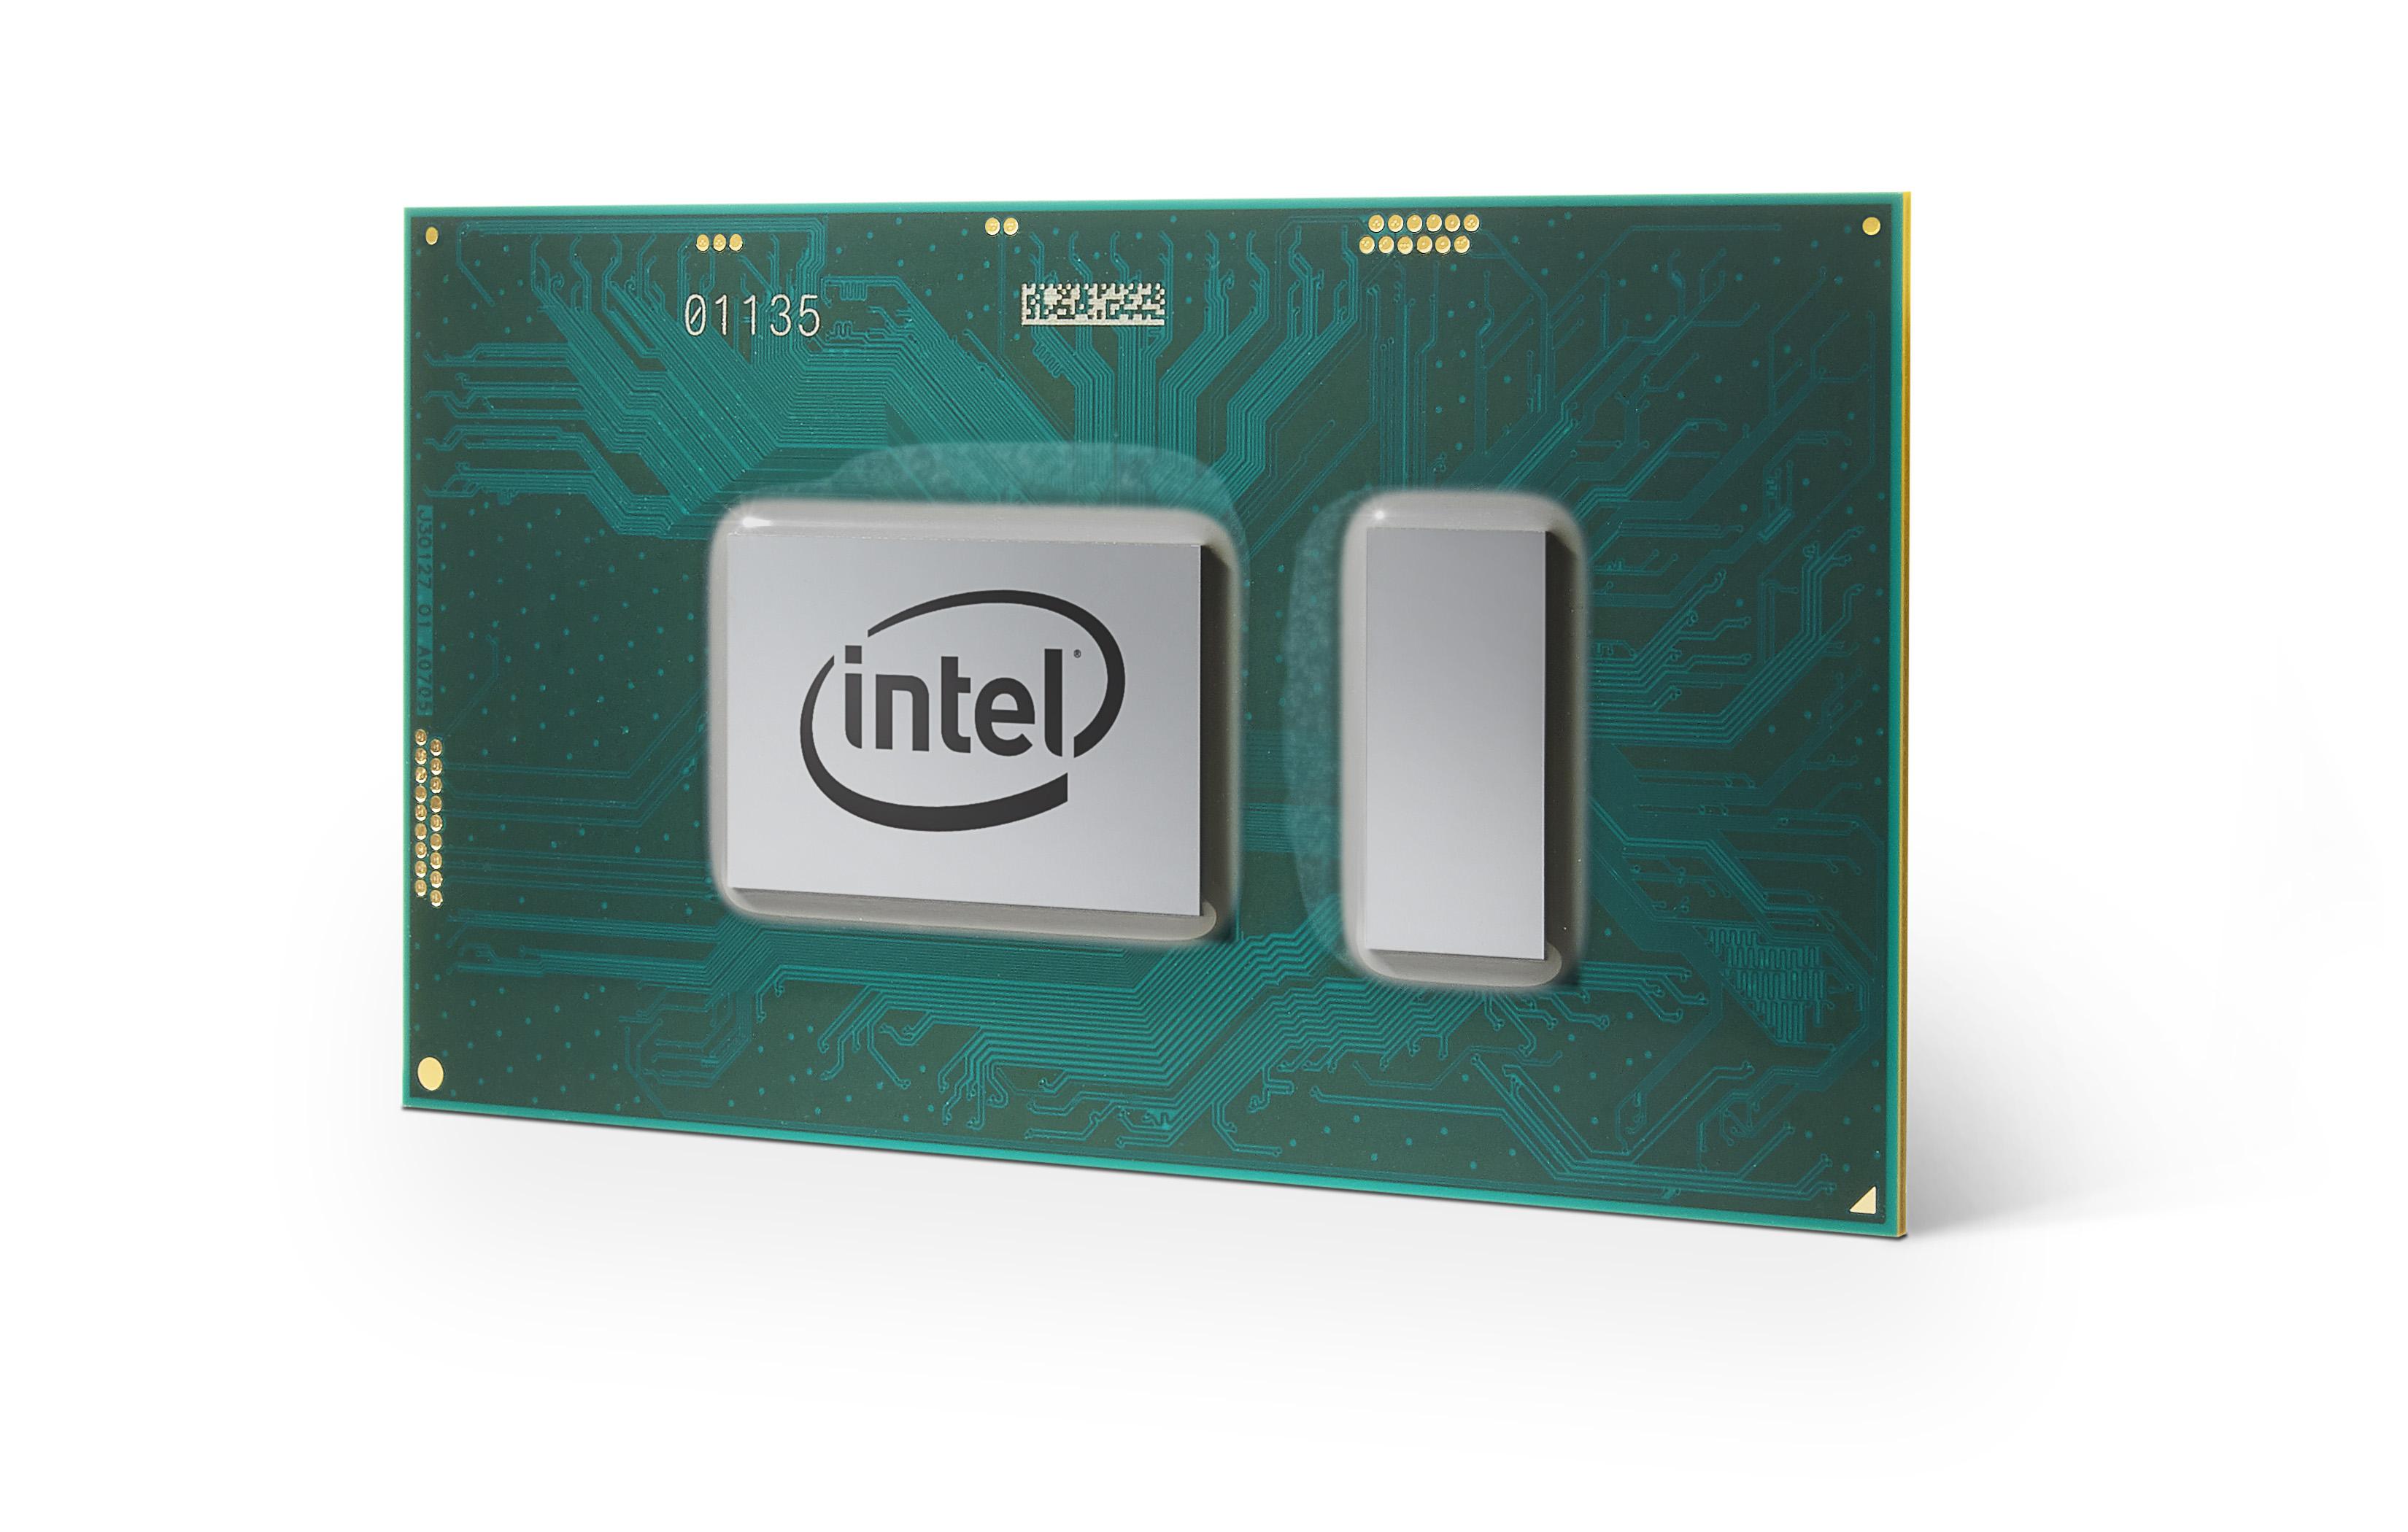 Intel Launches New 8th Gen Intel Core Processors